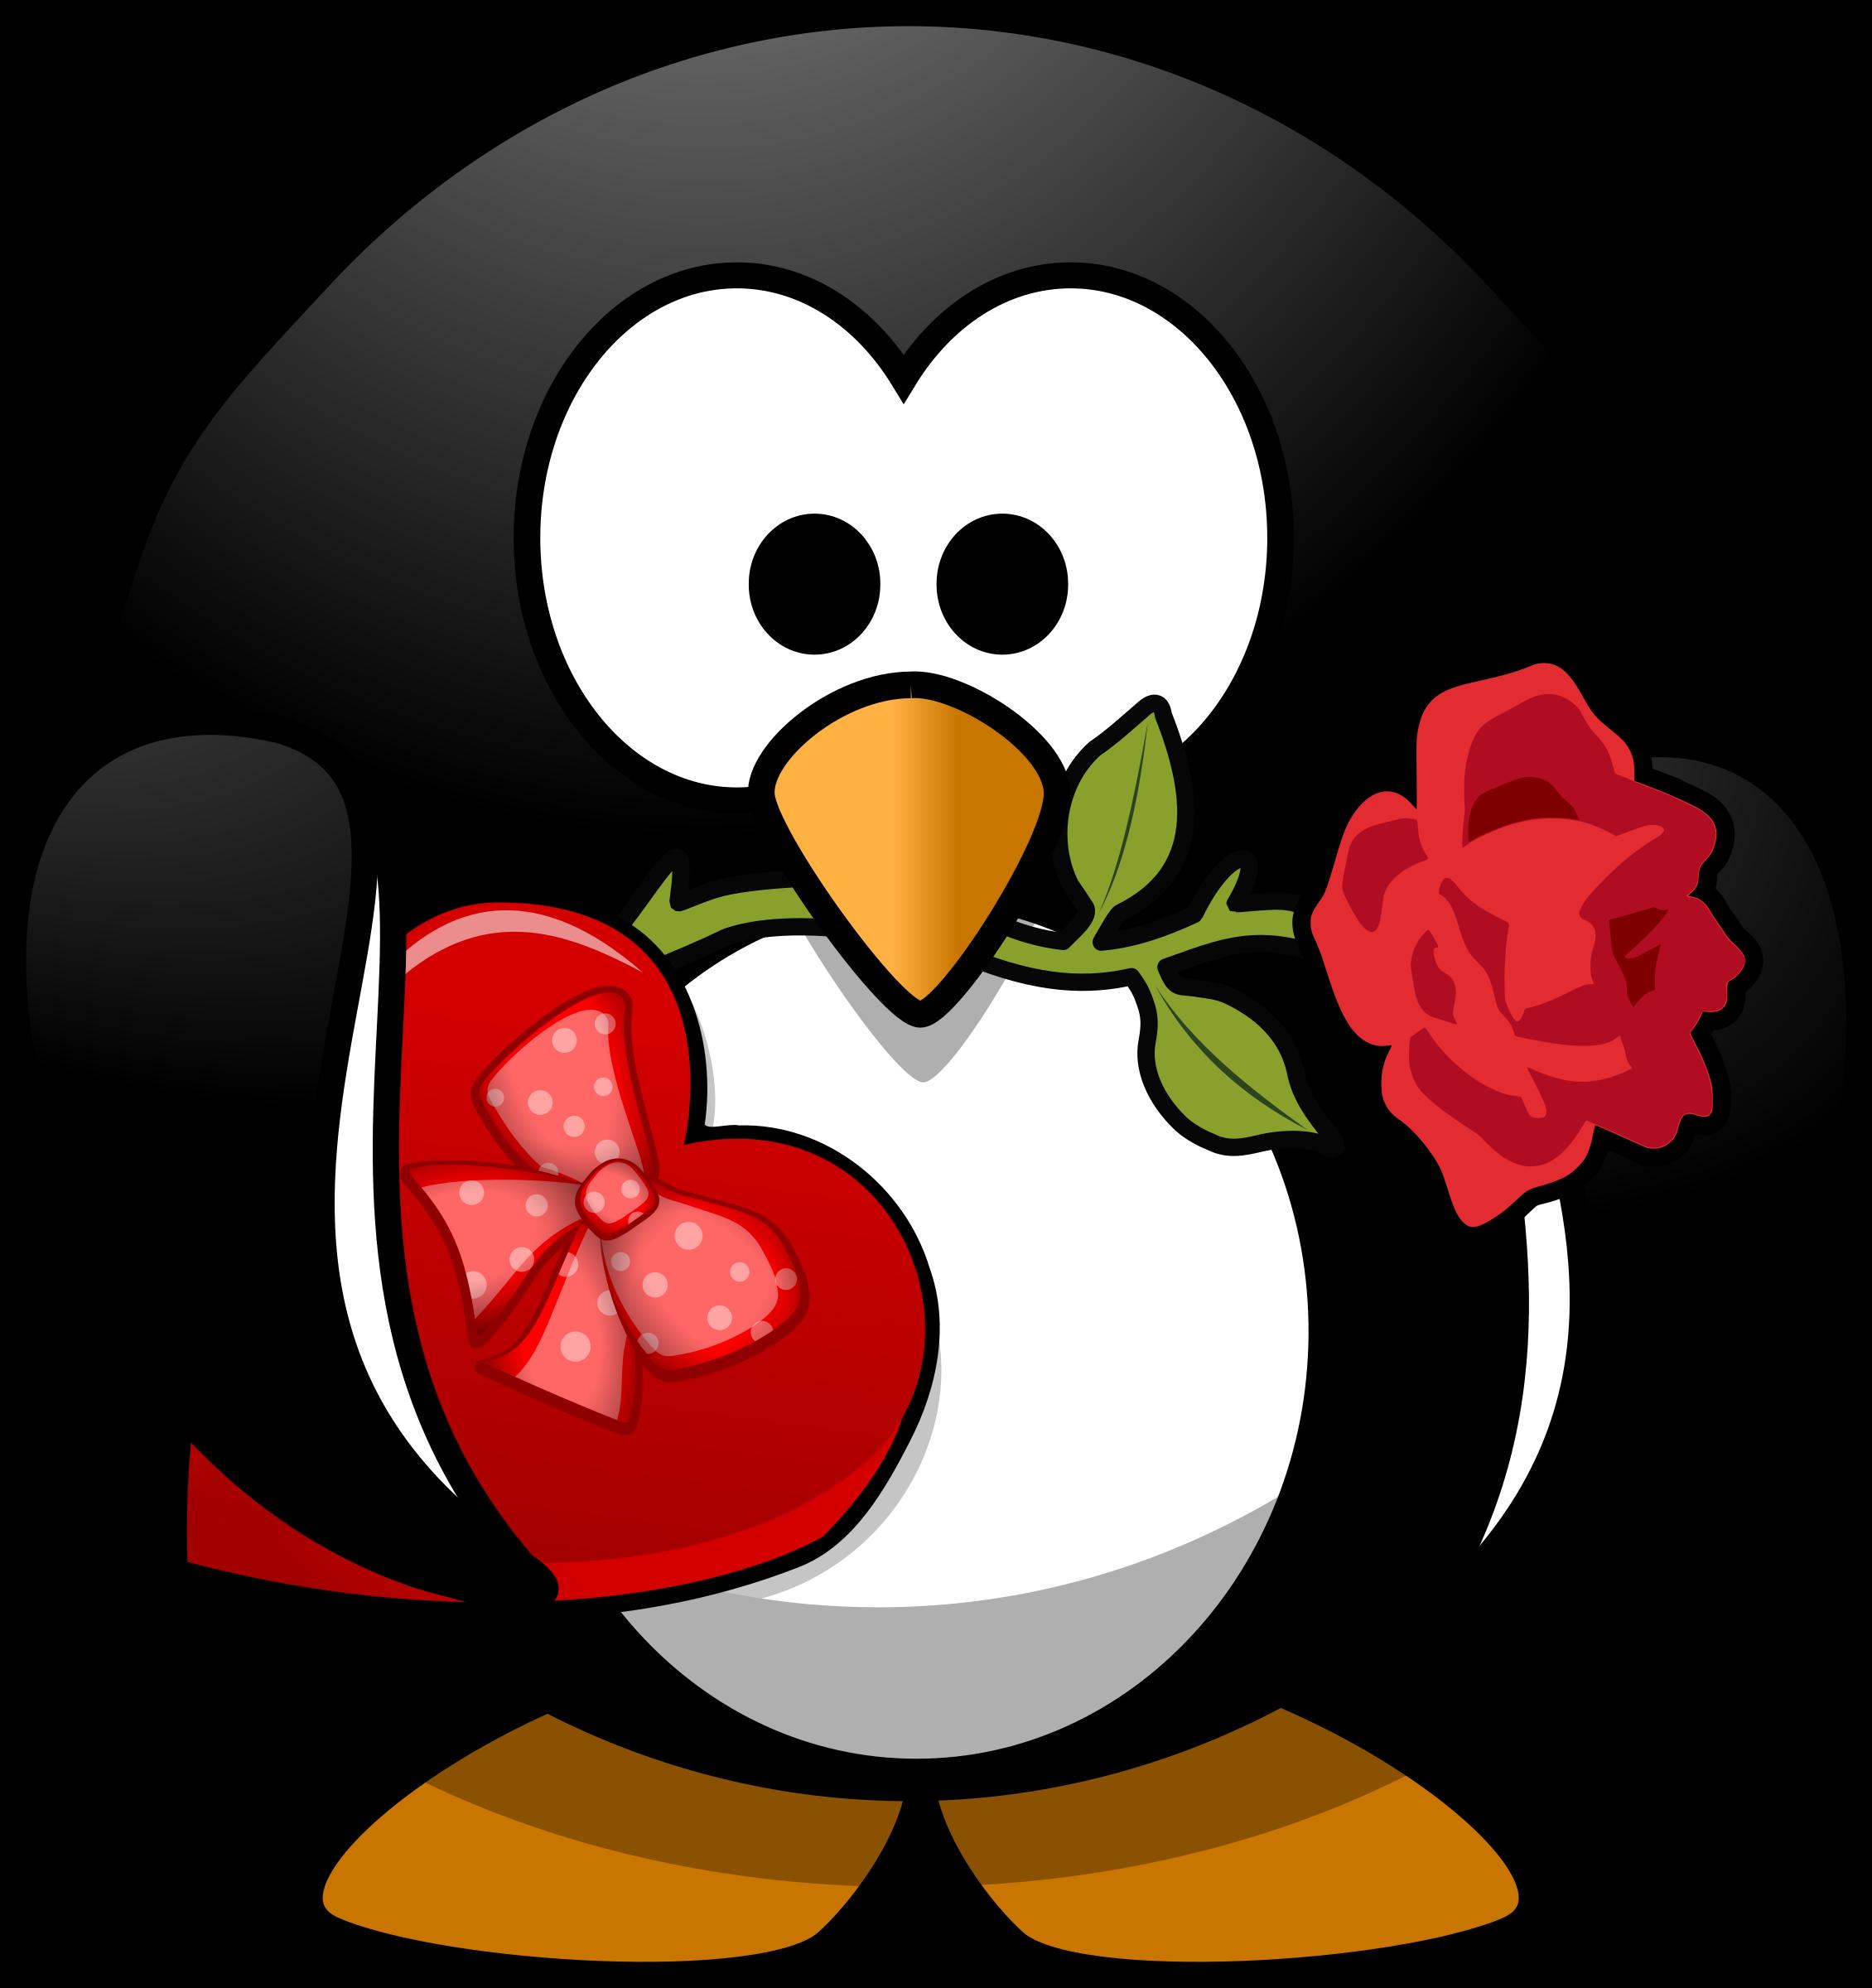 Microsoft free clipart valentines graphic download Clipart - Valentine Penguin graphic download